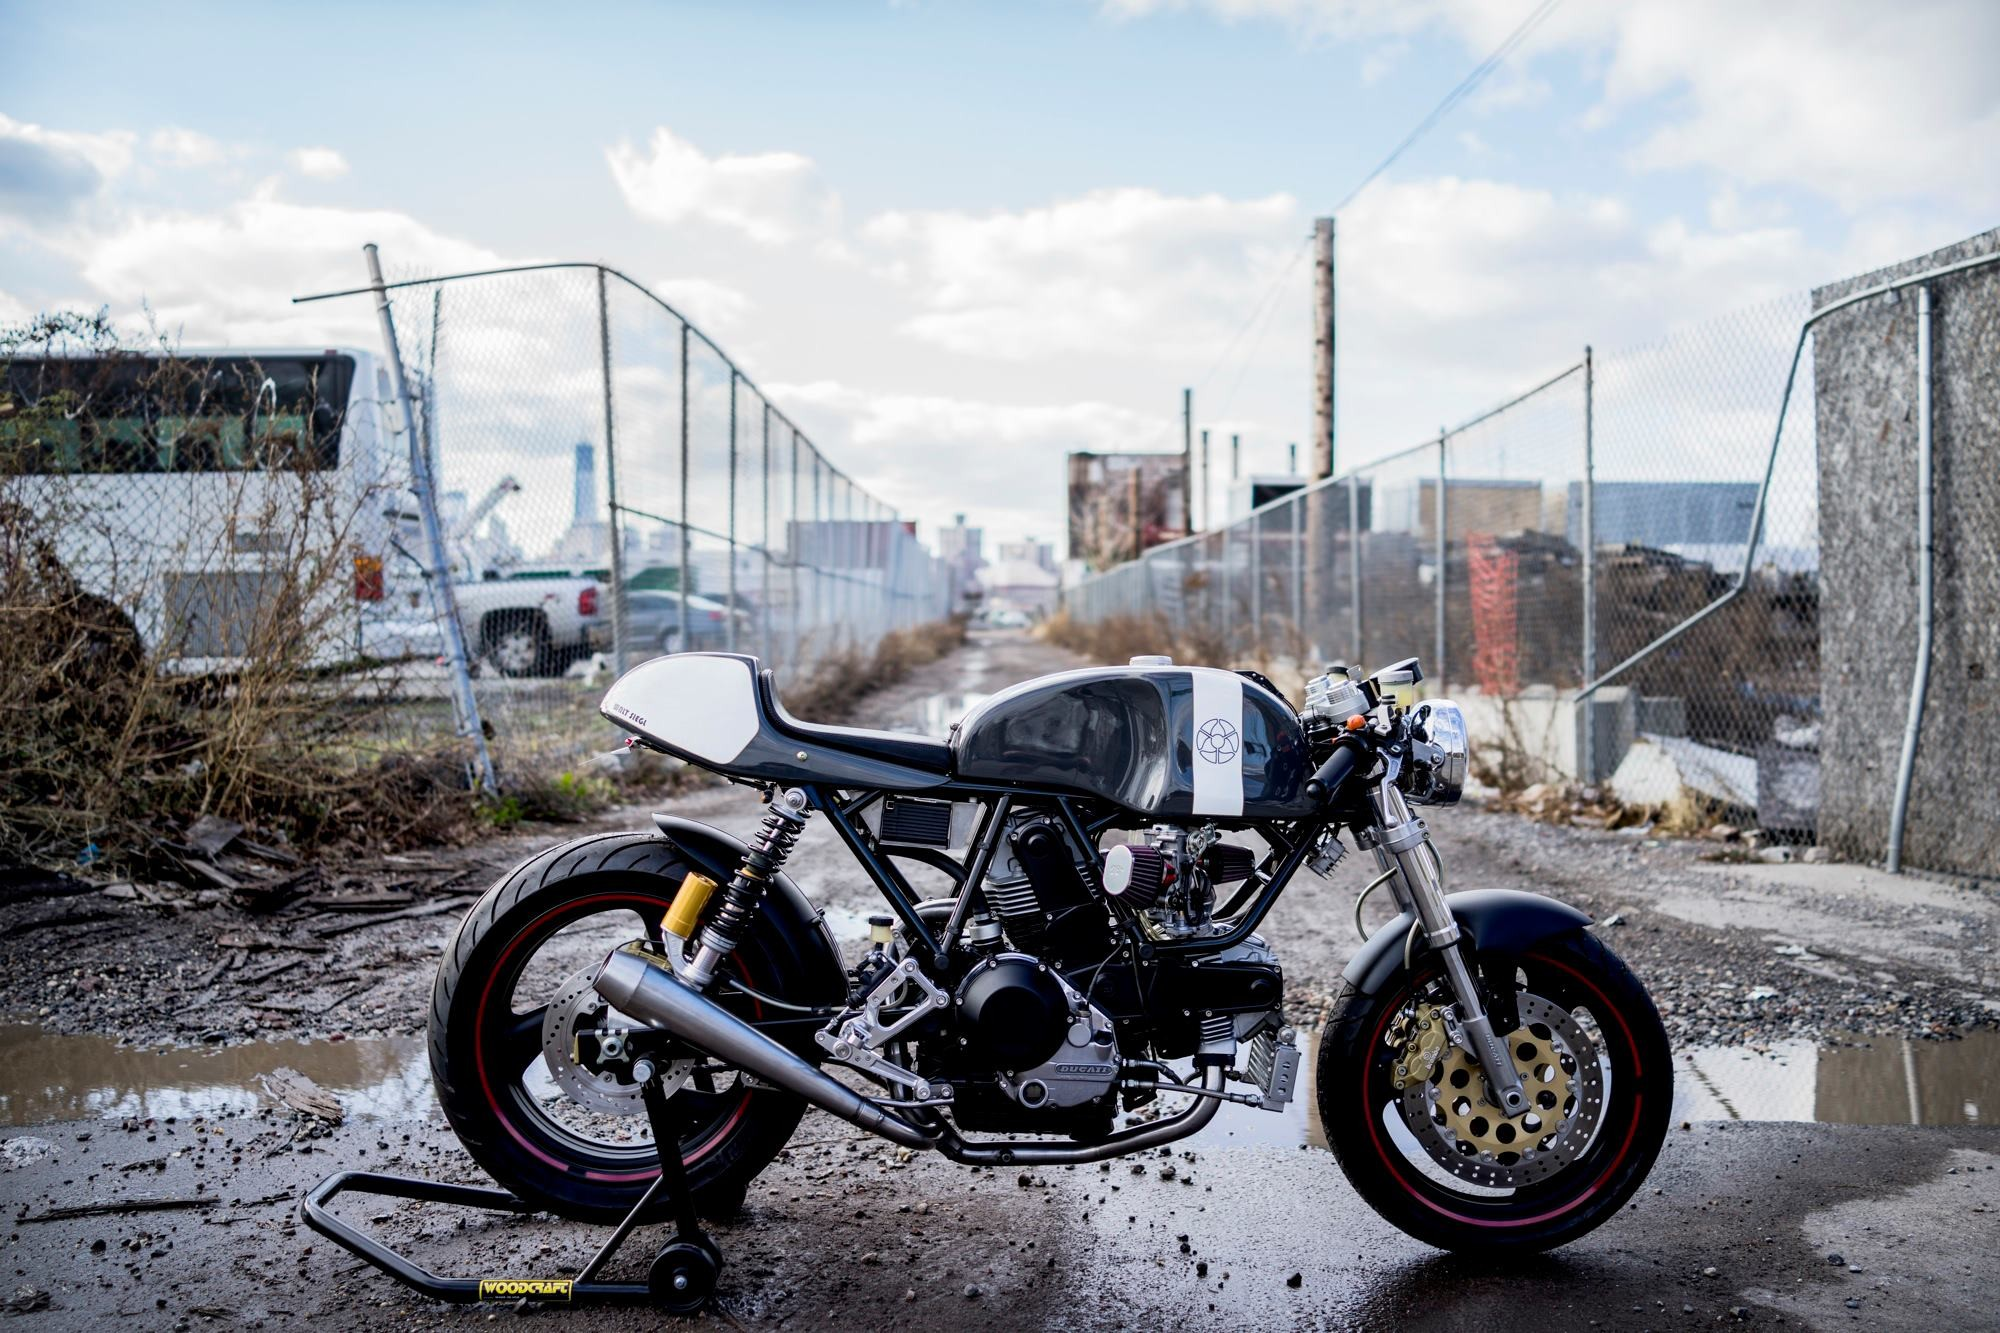 Ducati Scrambler Cafe Racer images (4)